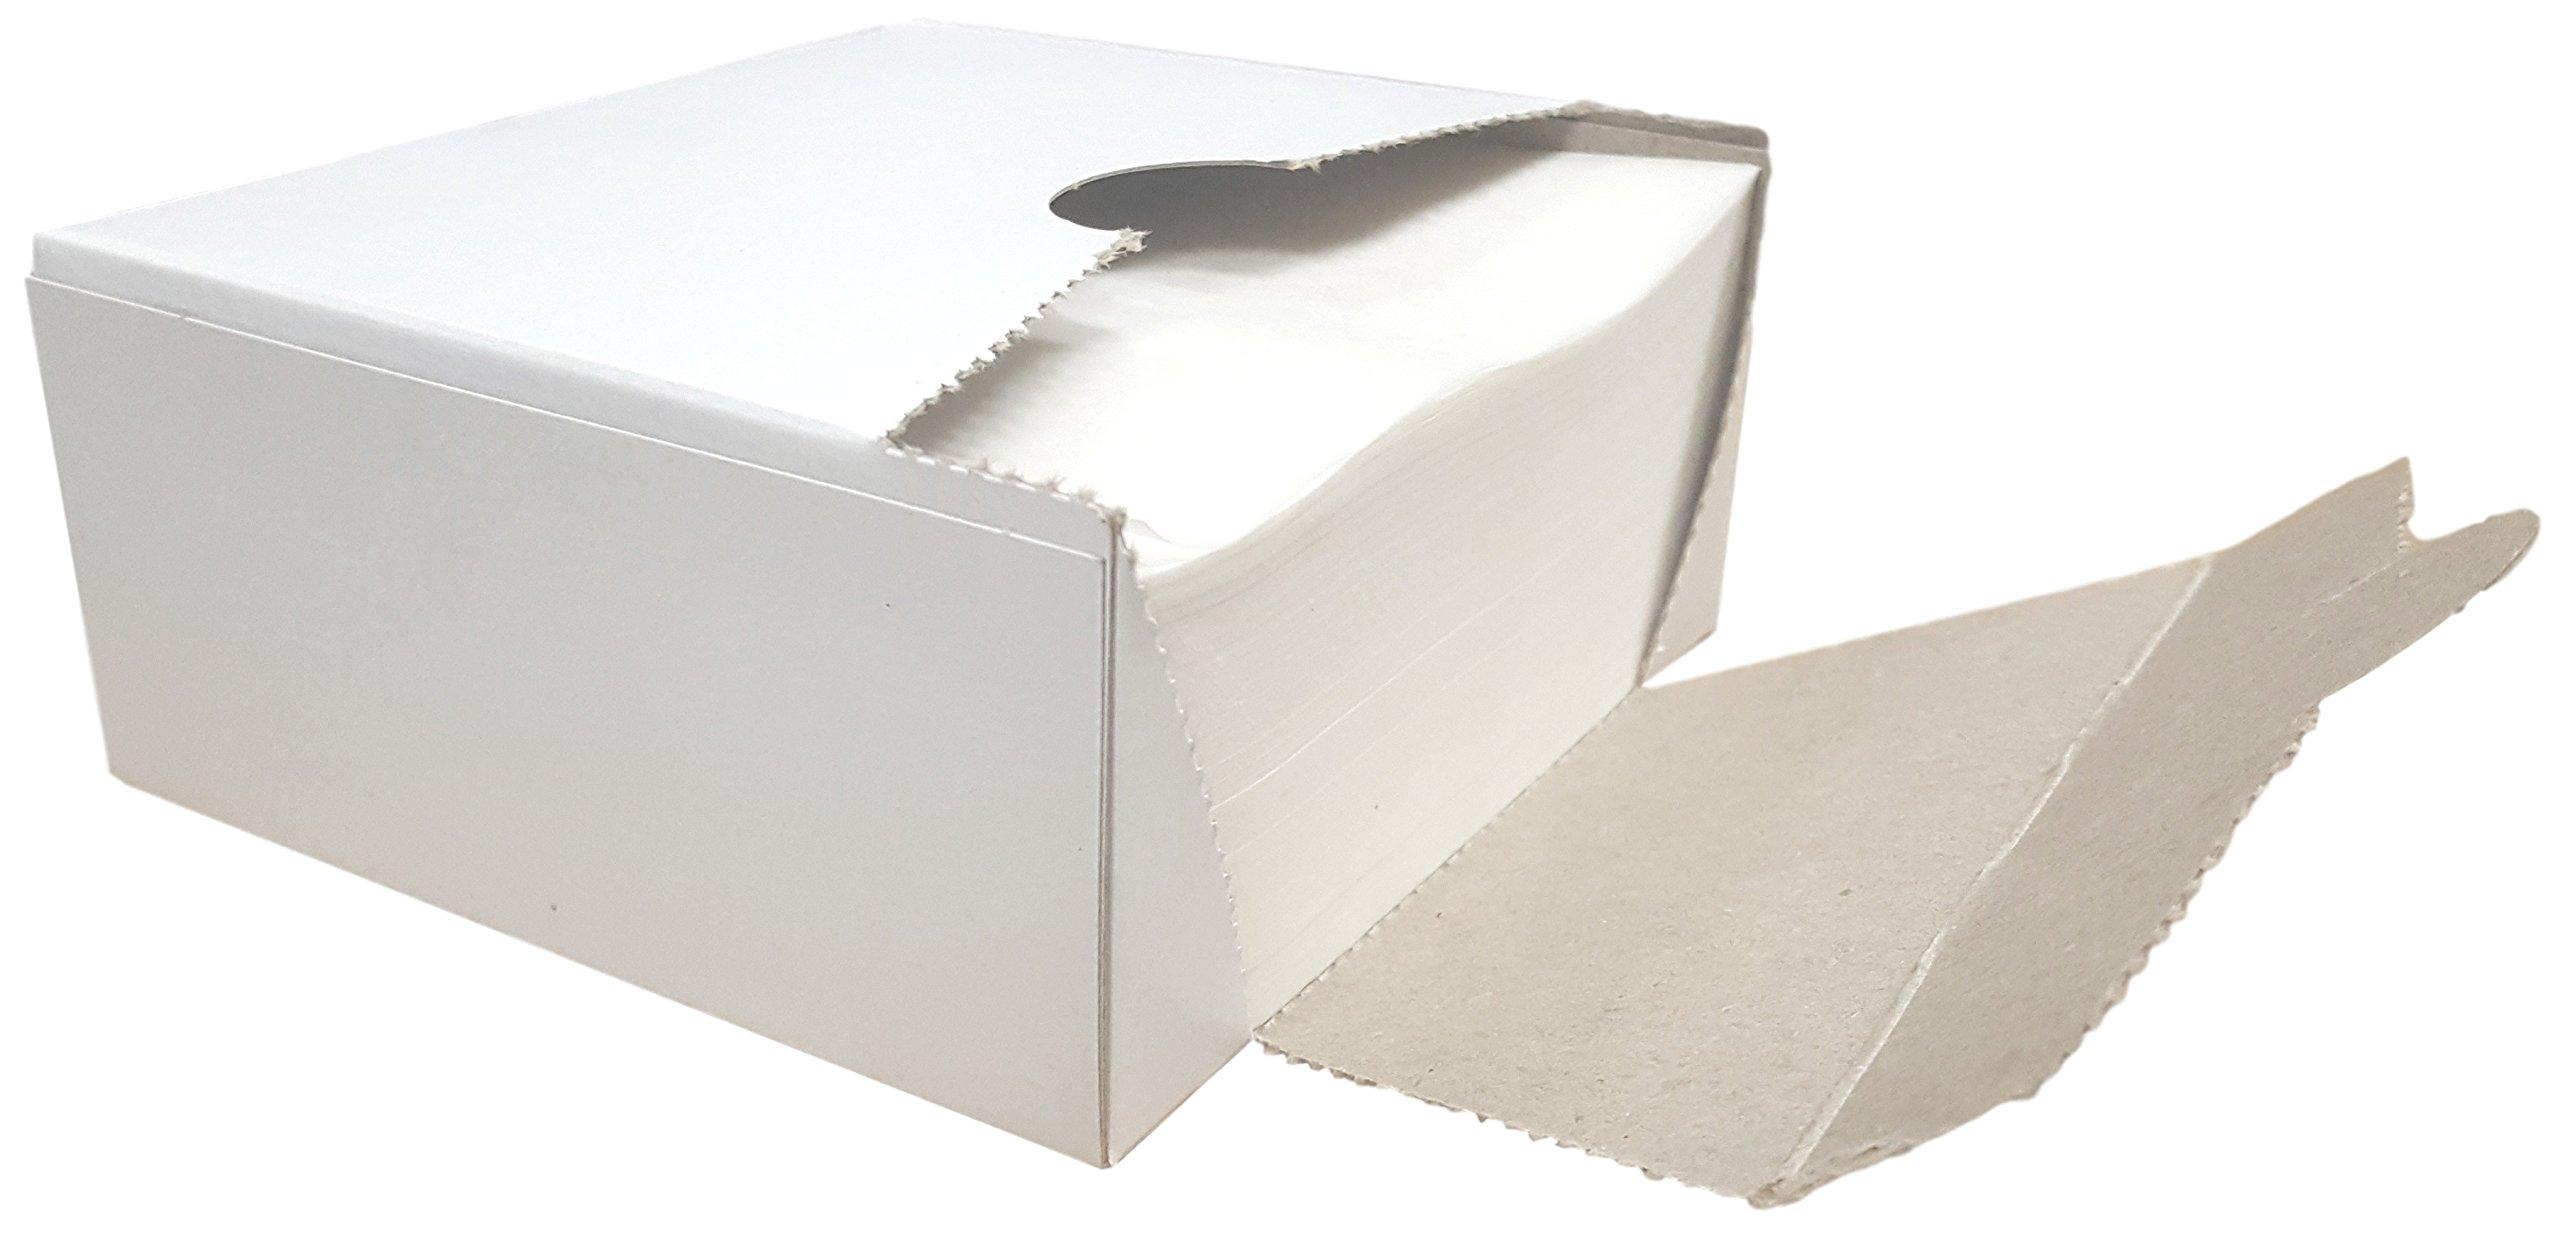 RJ Square Wax Paper Sheets - Hamburger Patty Paper Squares (1,000 Sheets) by RJ